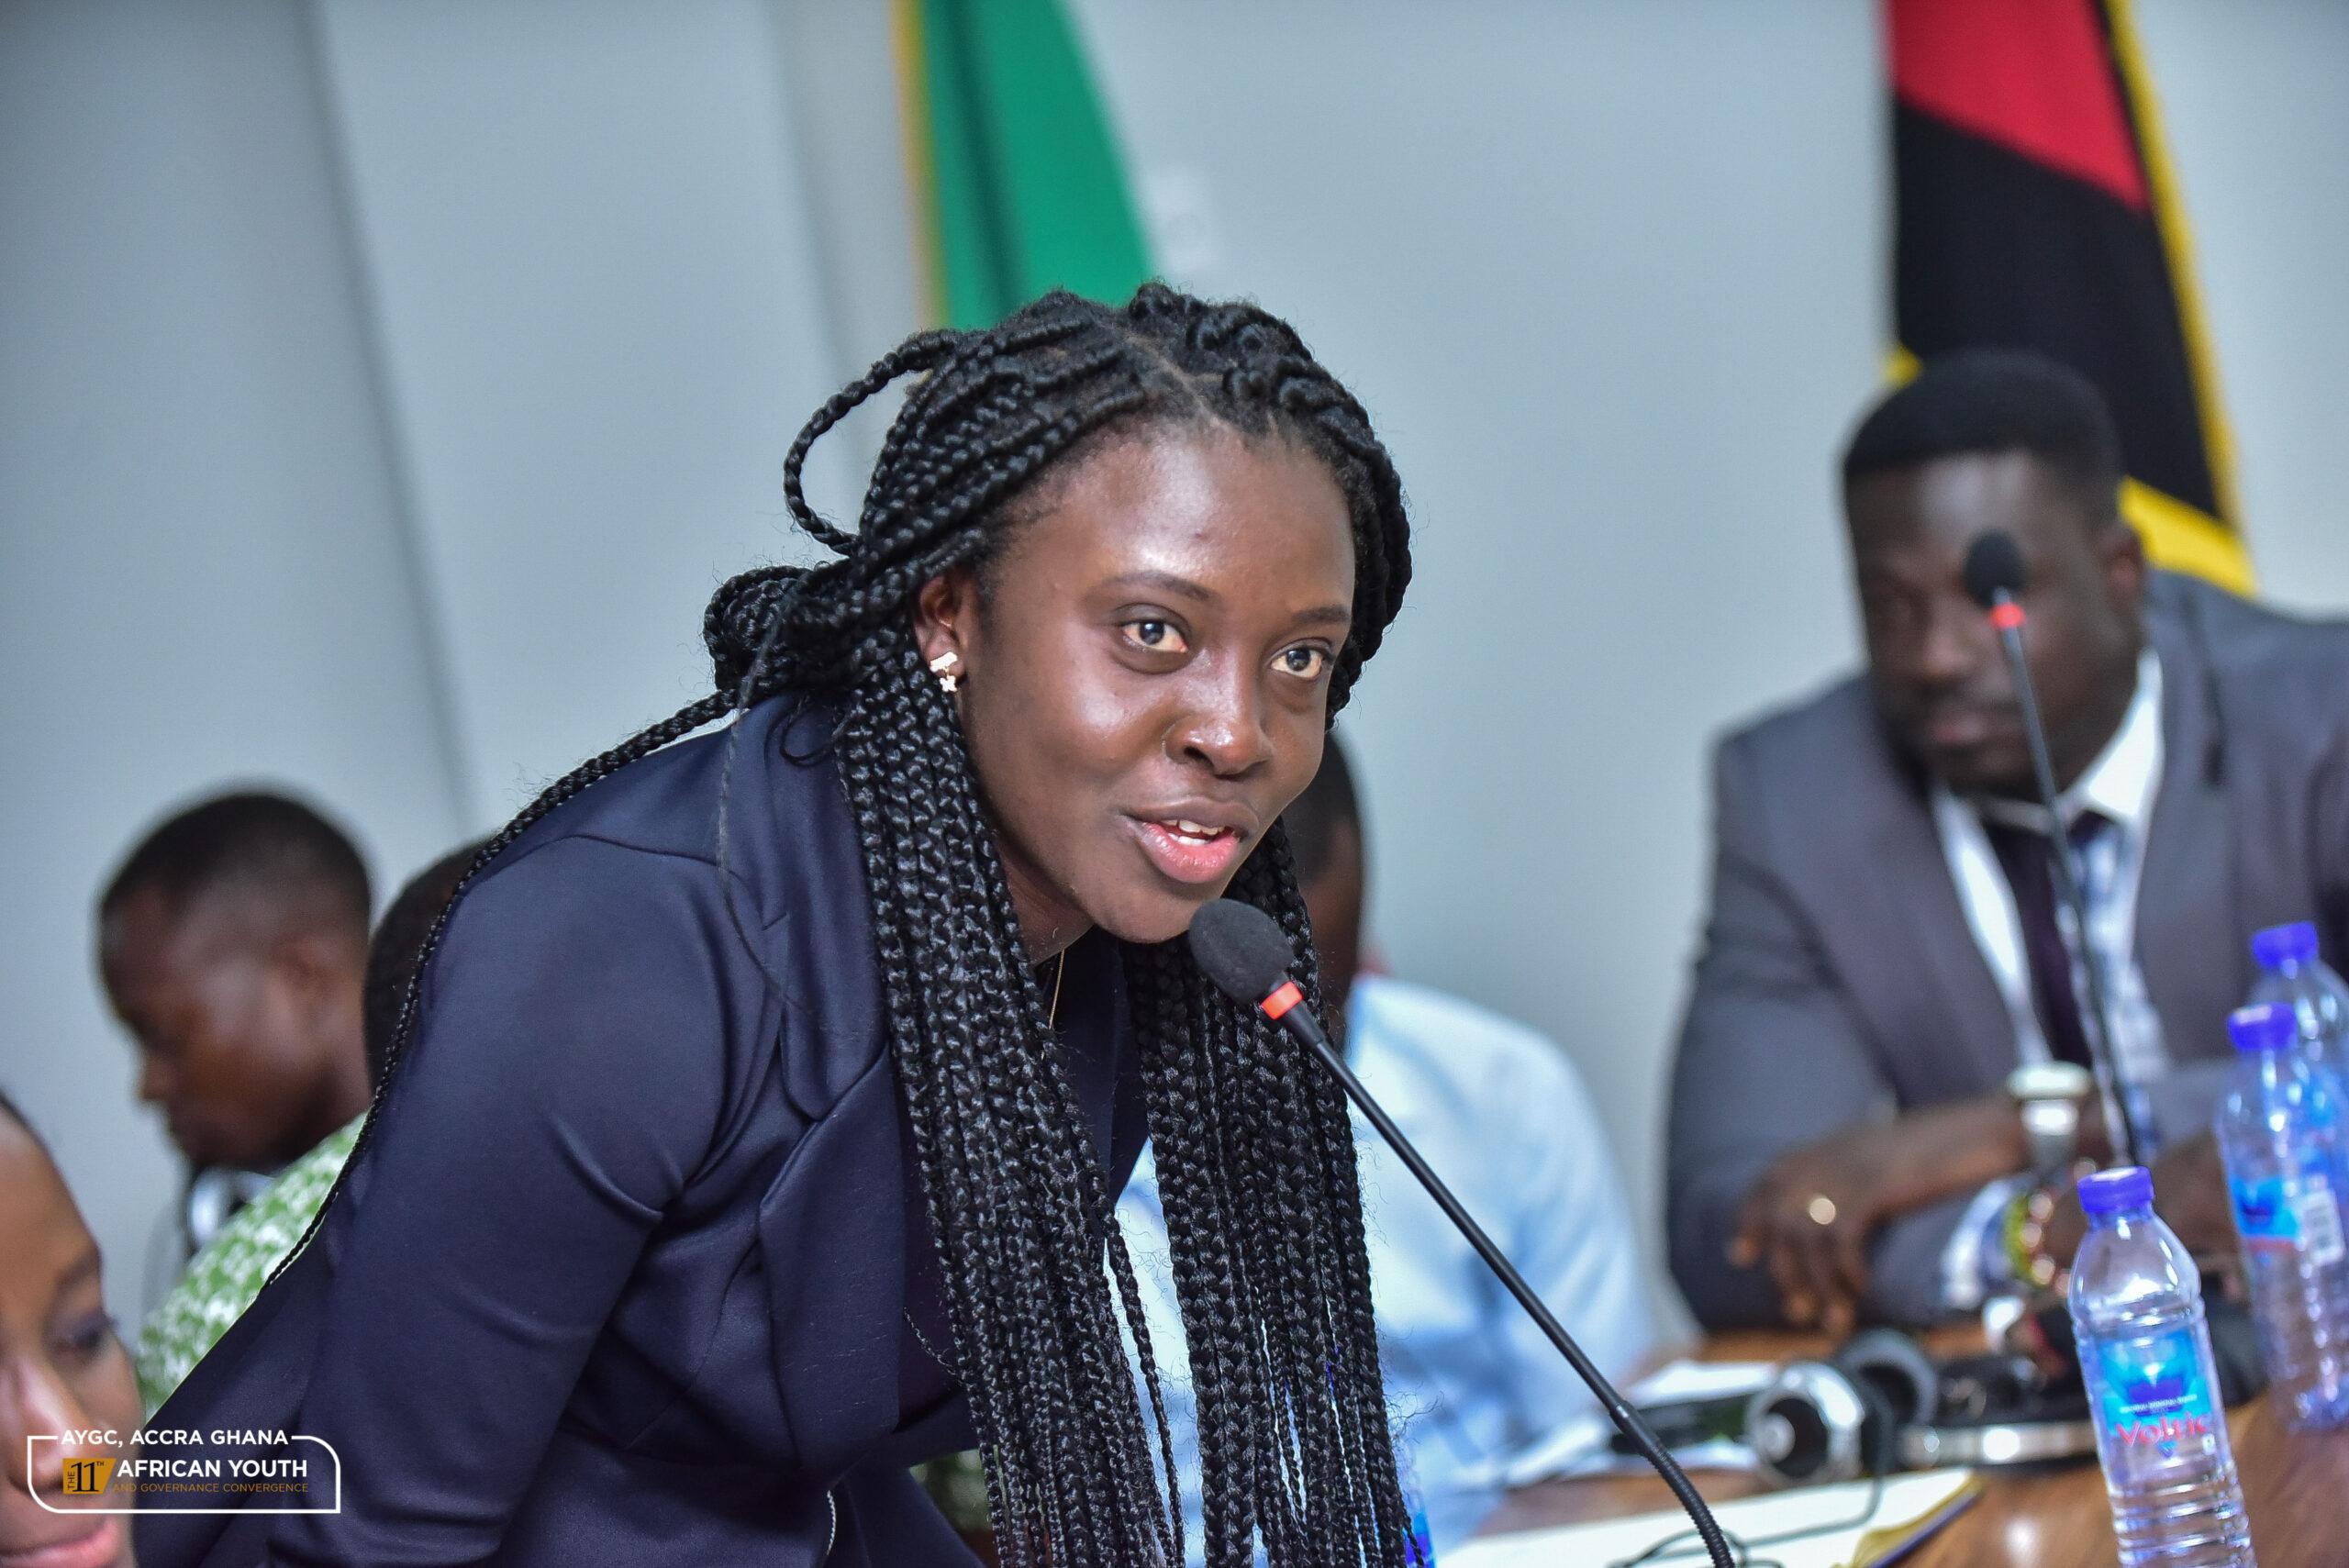 African Youth and Governance Convergence - Cornelia Opoku Gyemfi